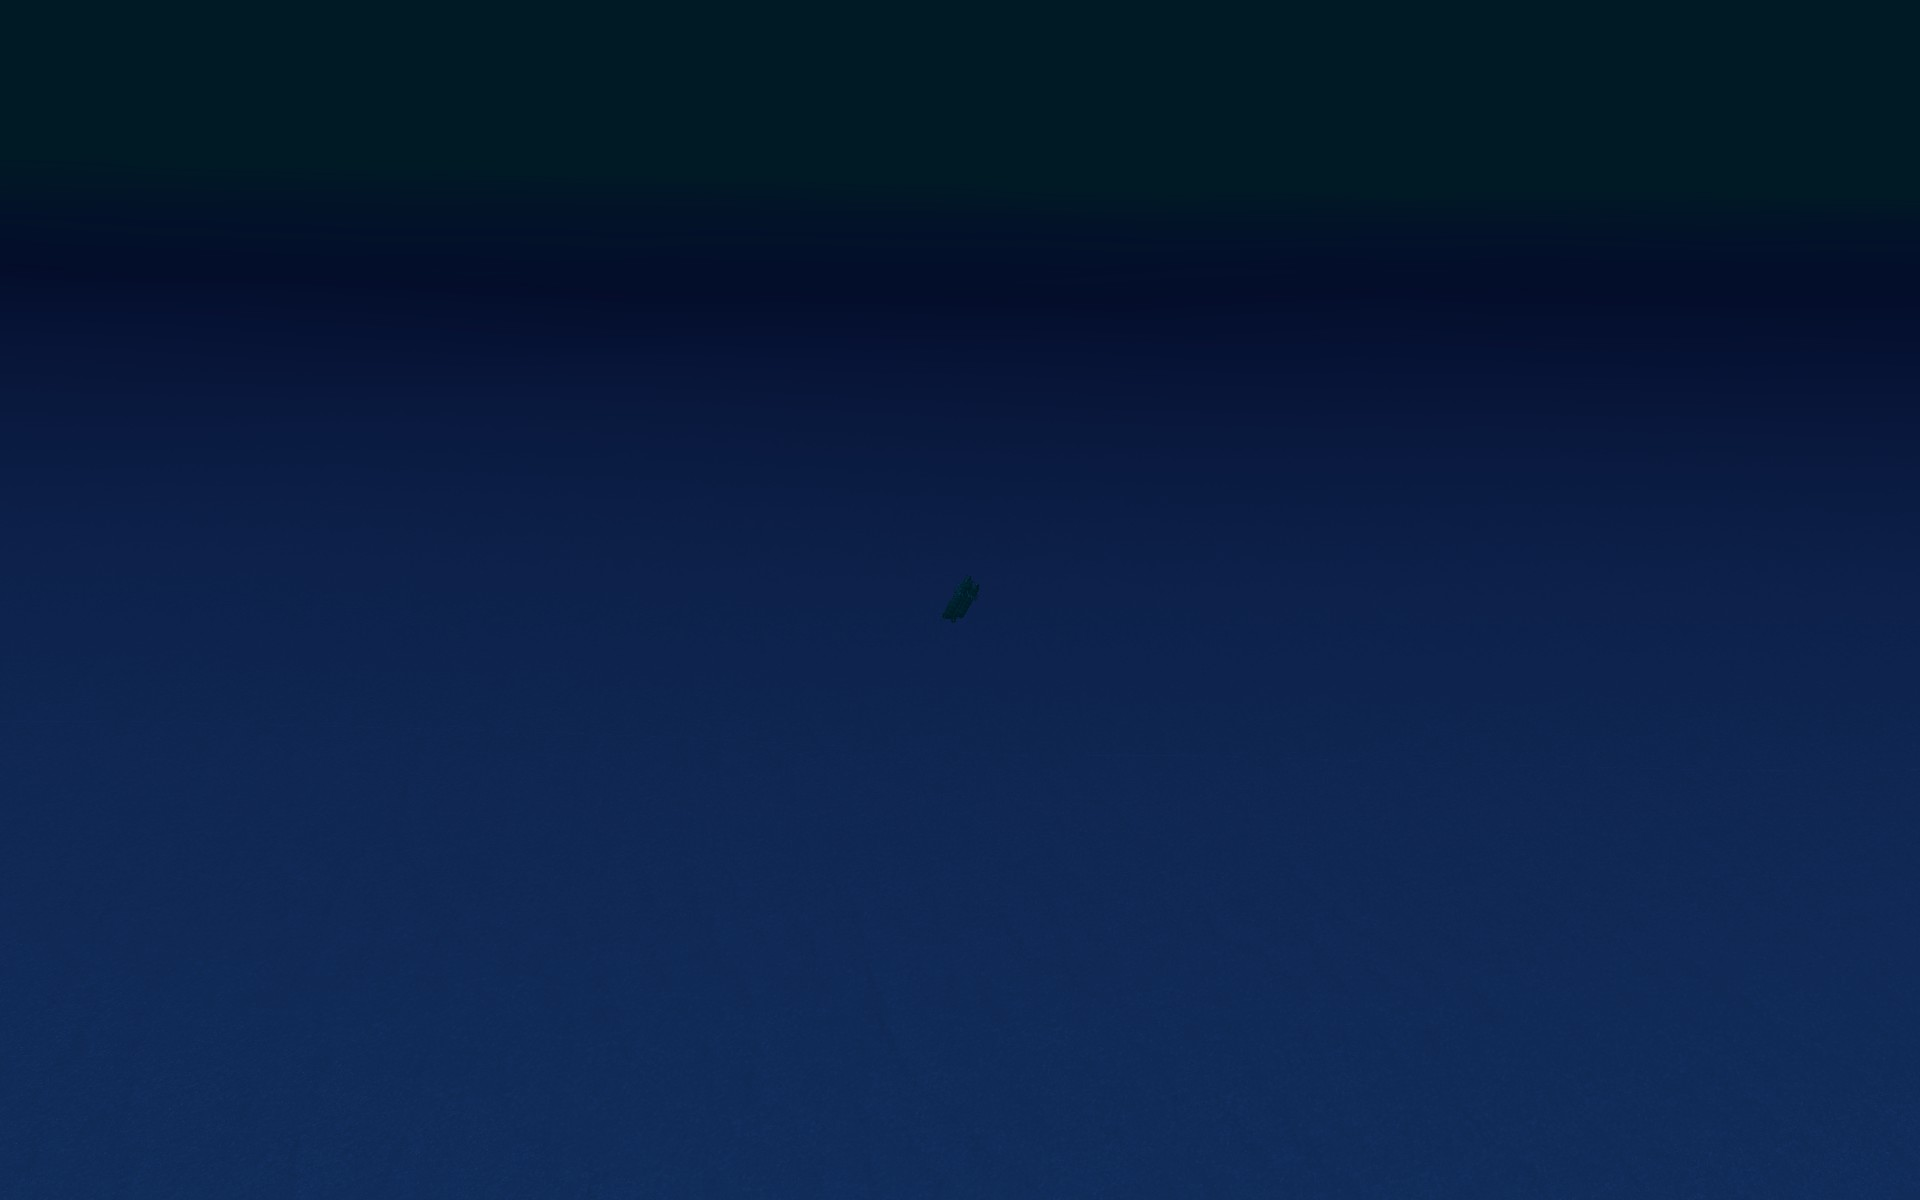 kerbal space program bugs - photo #29